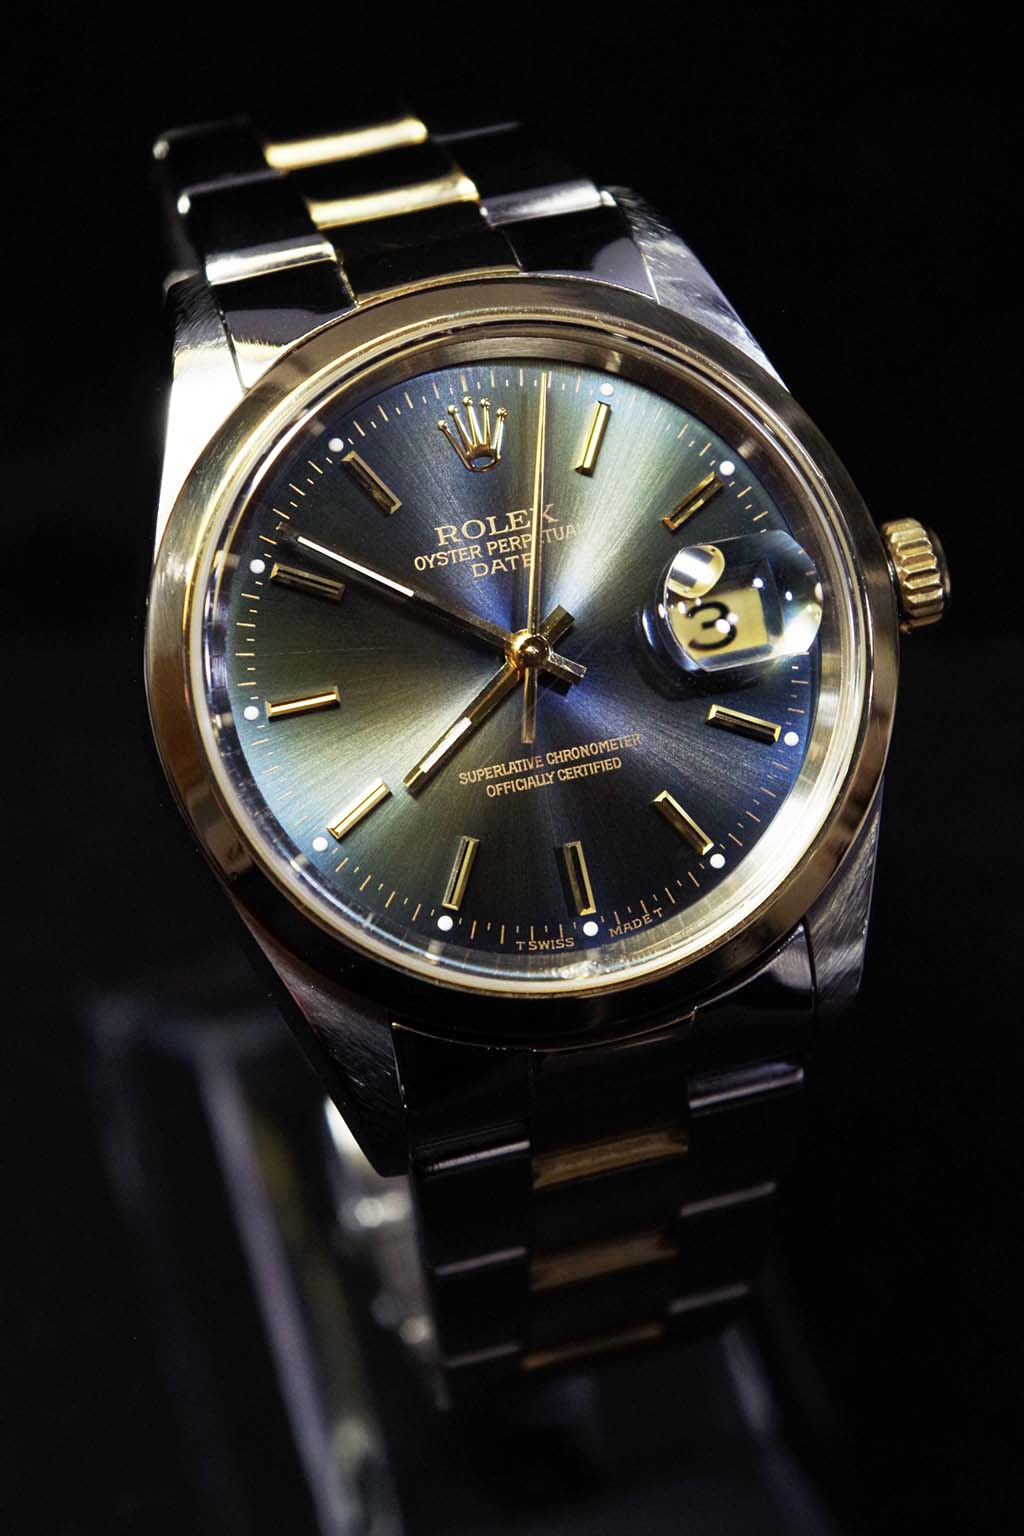 Rolex Oyster Watch Repair